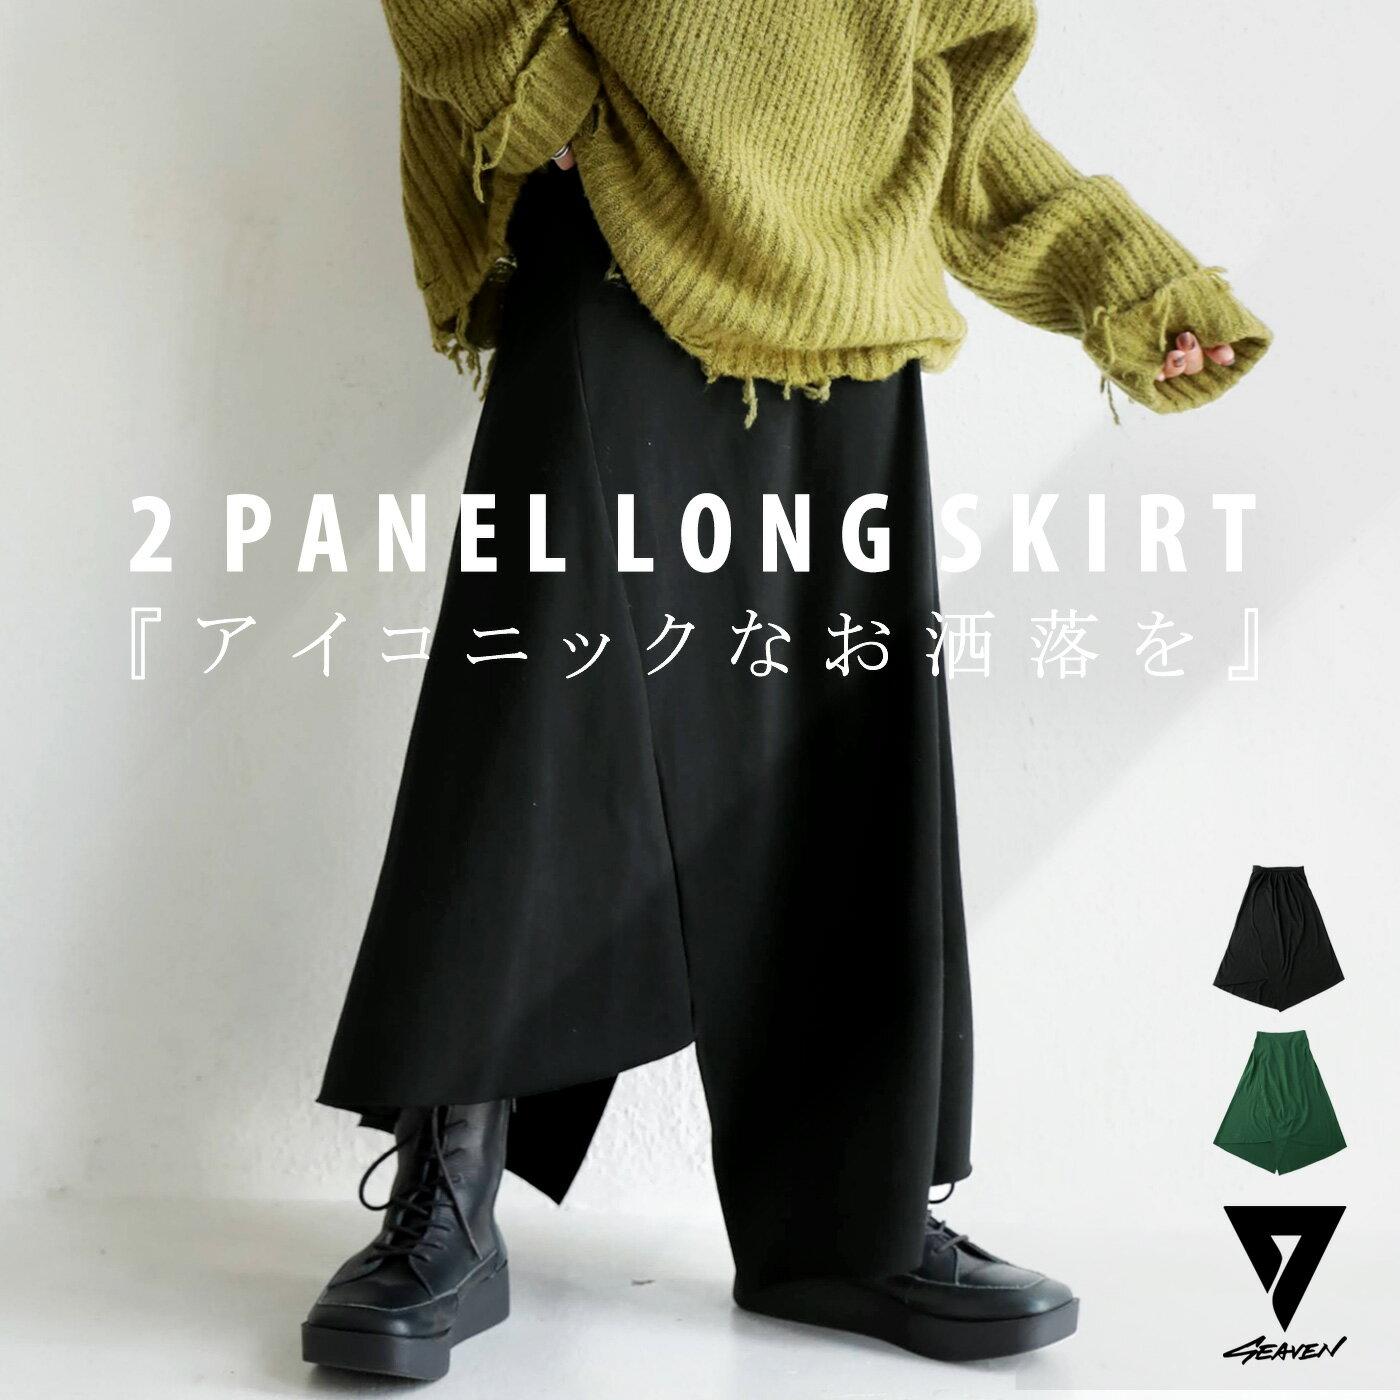 「SEAVEN」2-PANEL LONG SKIRT 2パネルロングスカート・10月18日20時~発売。メール便不可